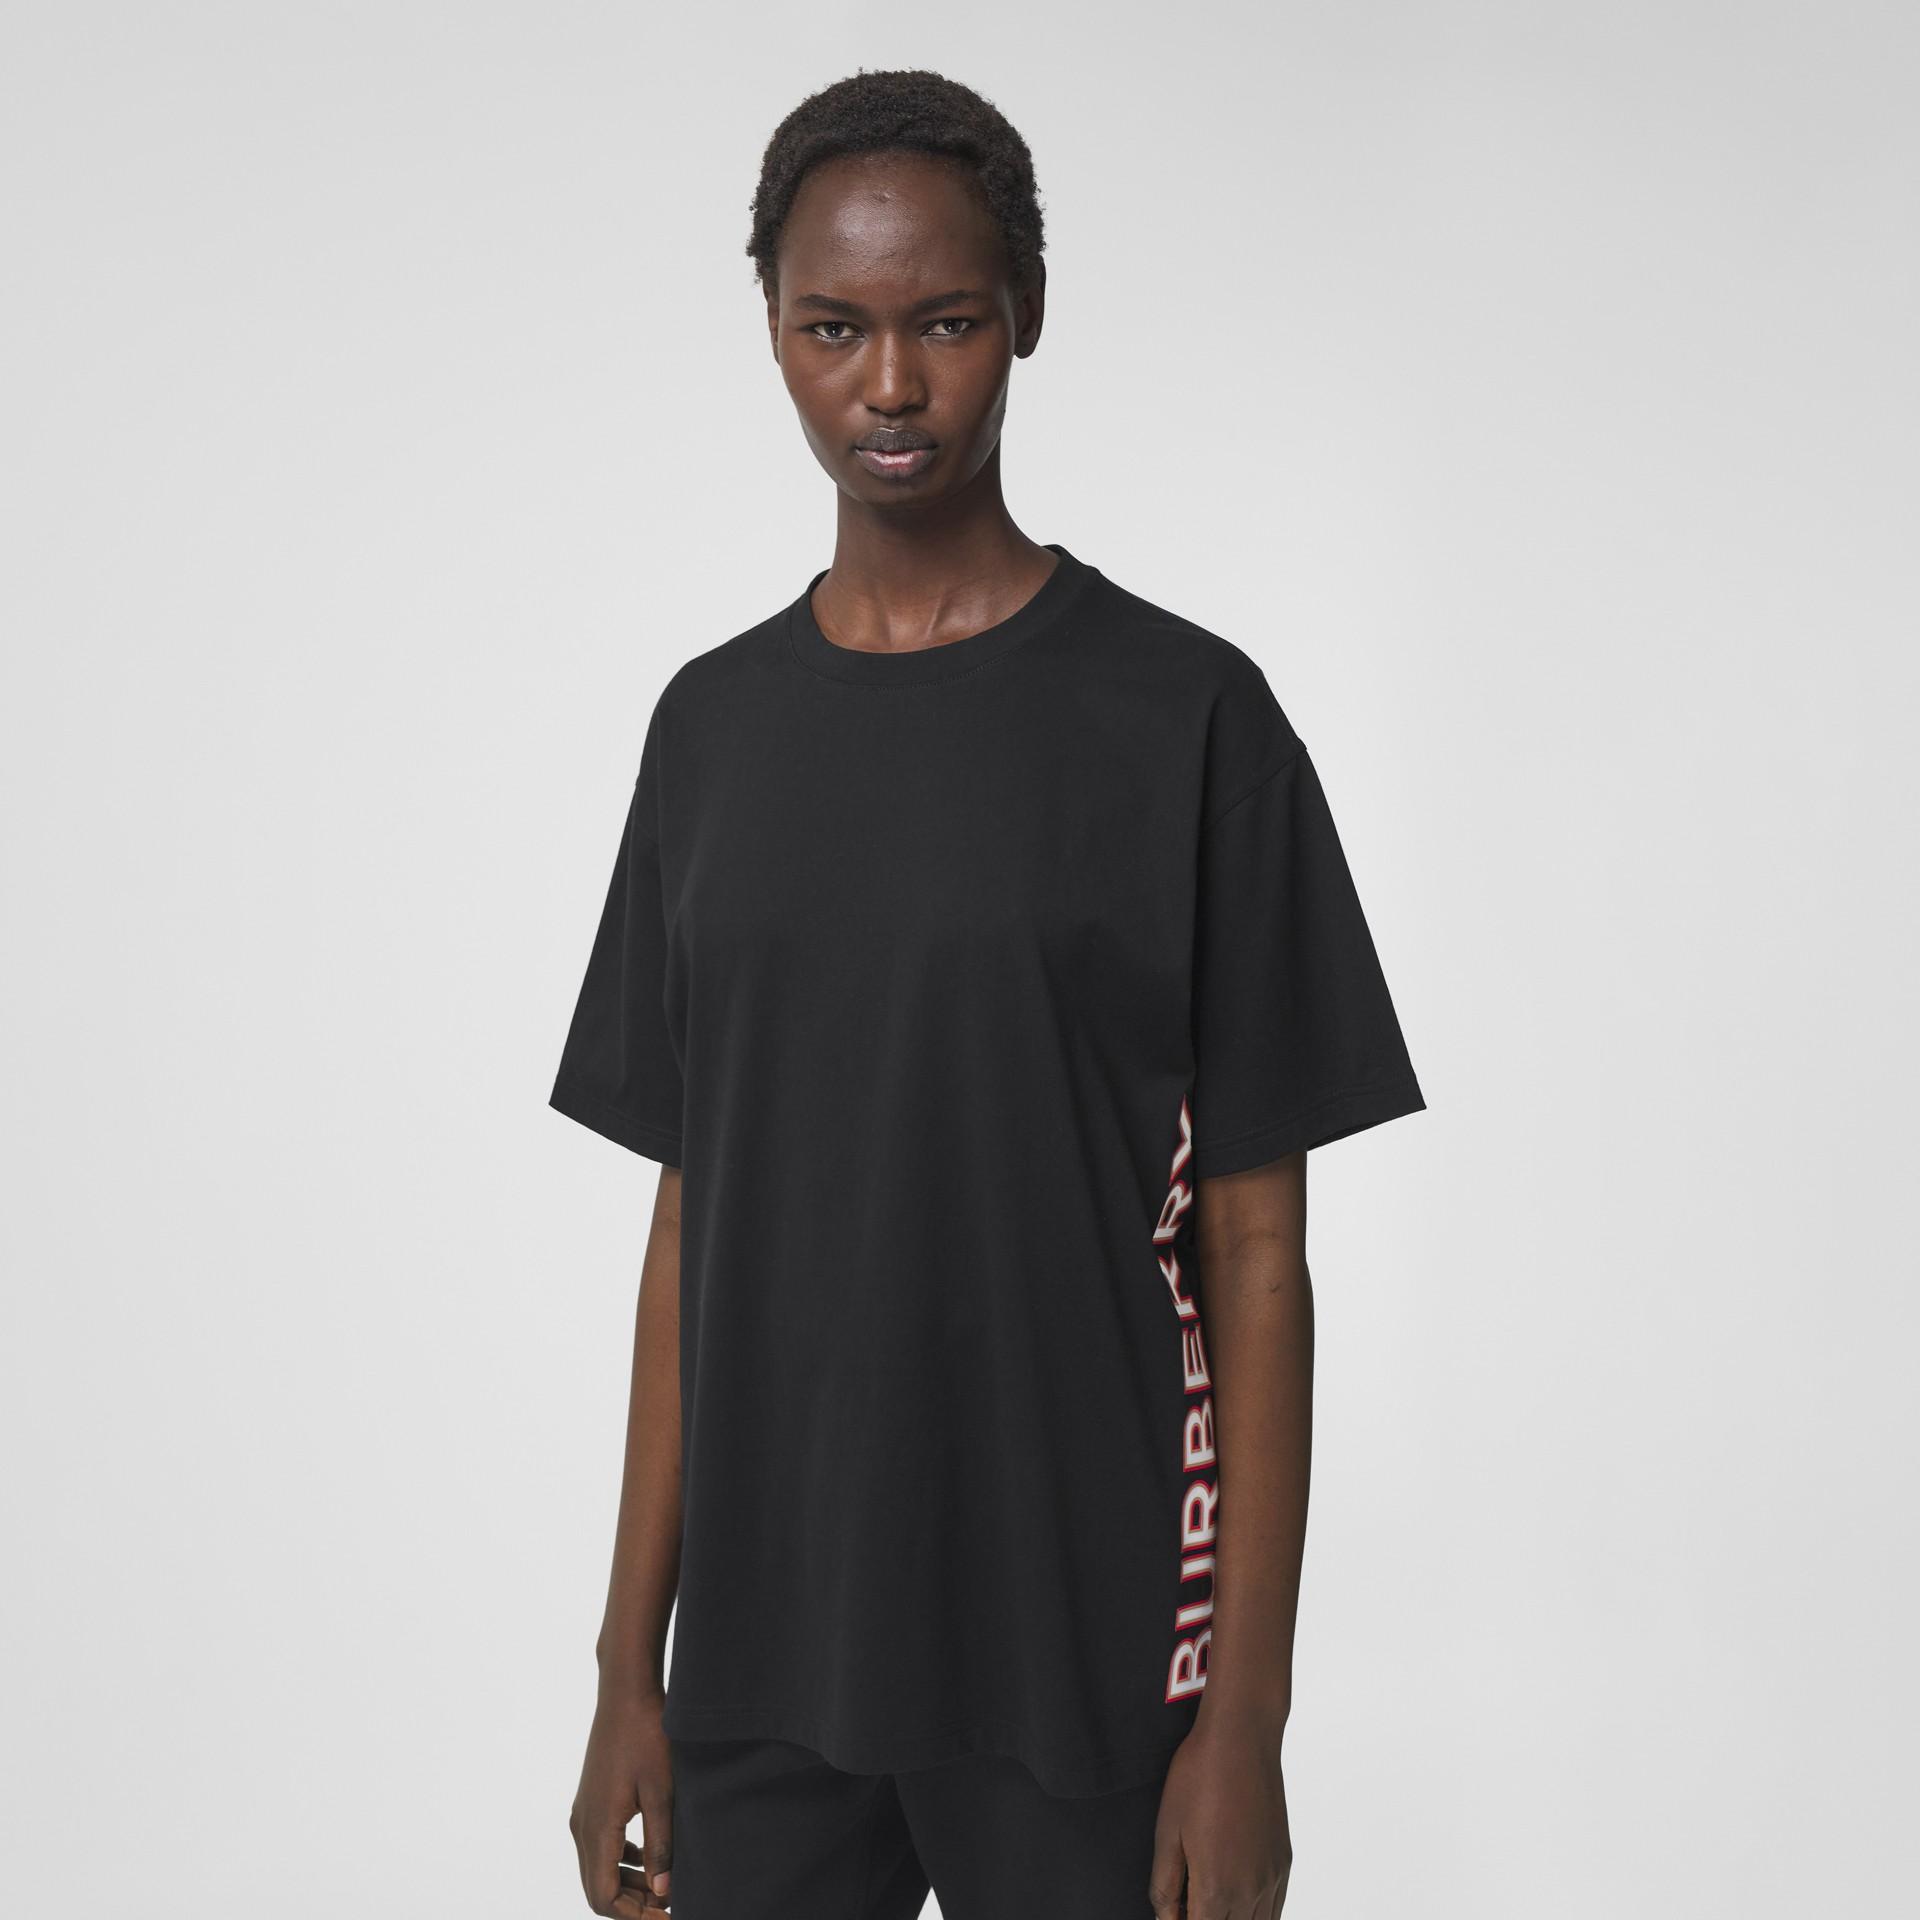 Logo Print Cotton Oversized T-shirt in Black - Women | Burberry - gallery image 3